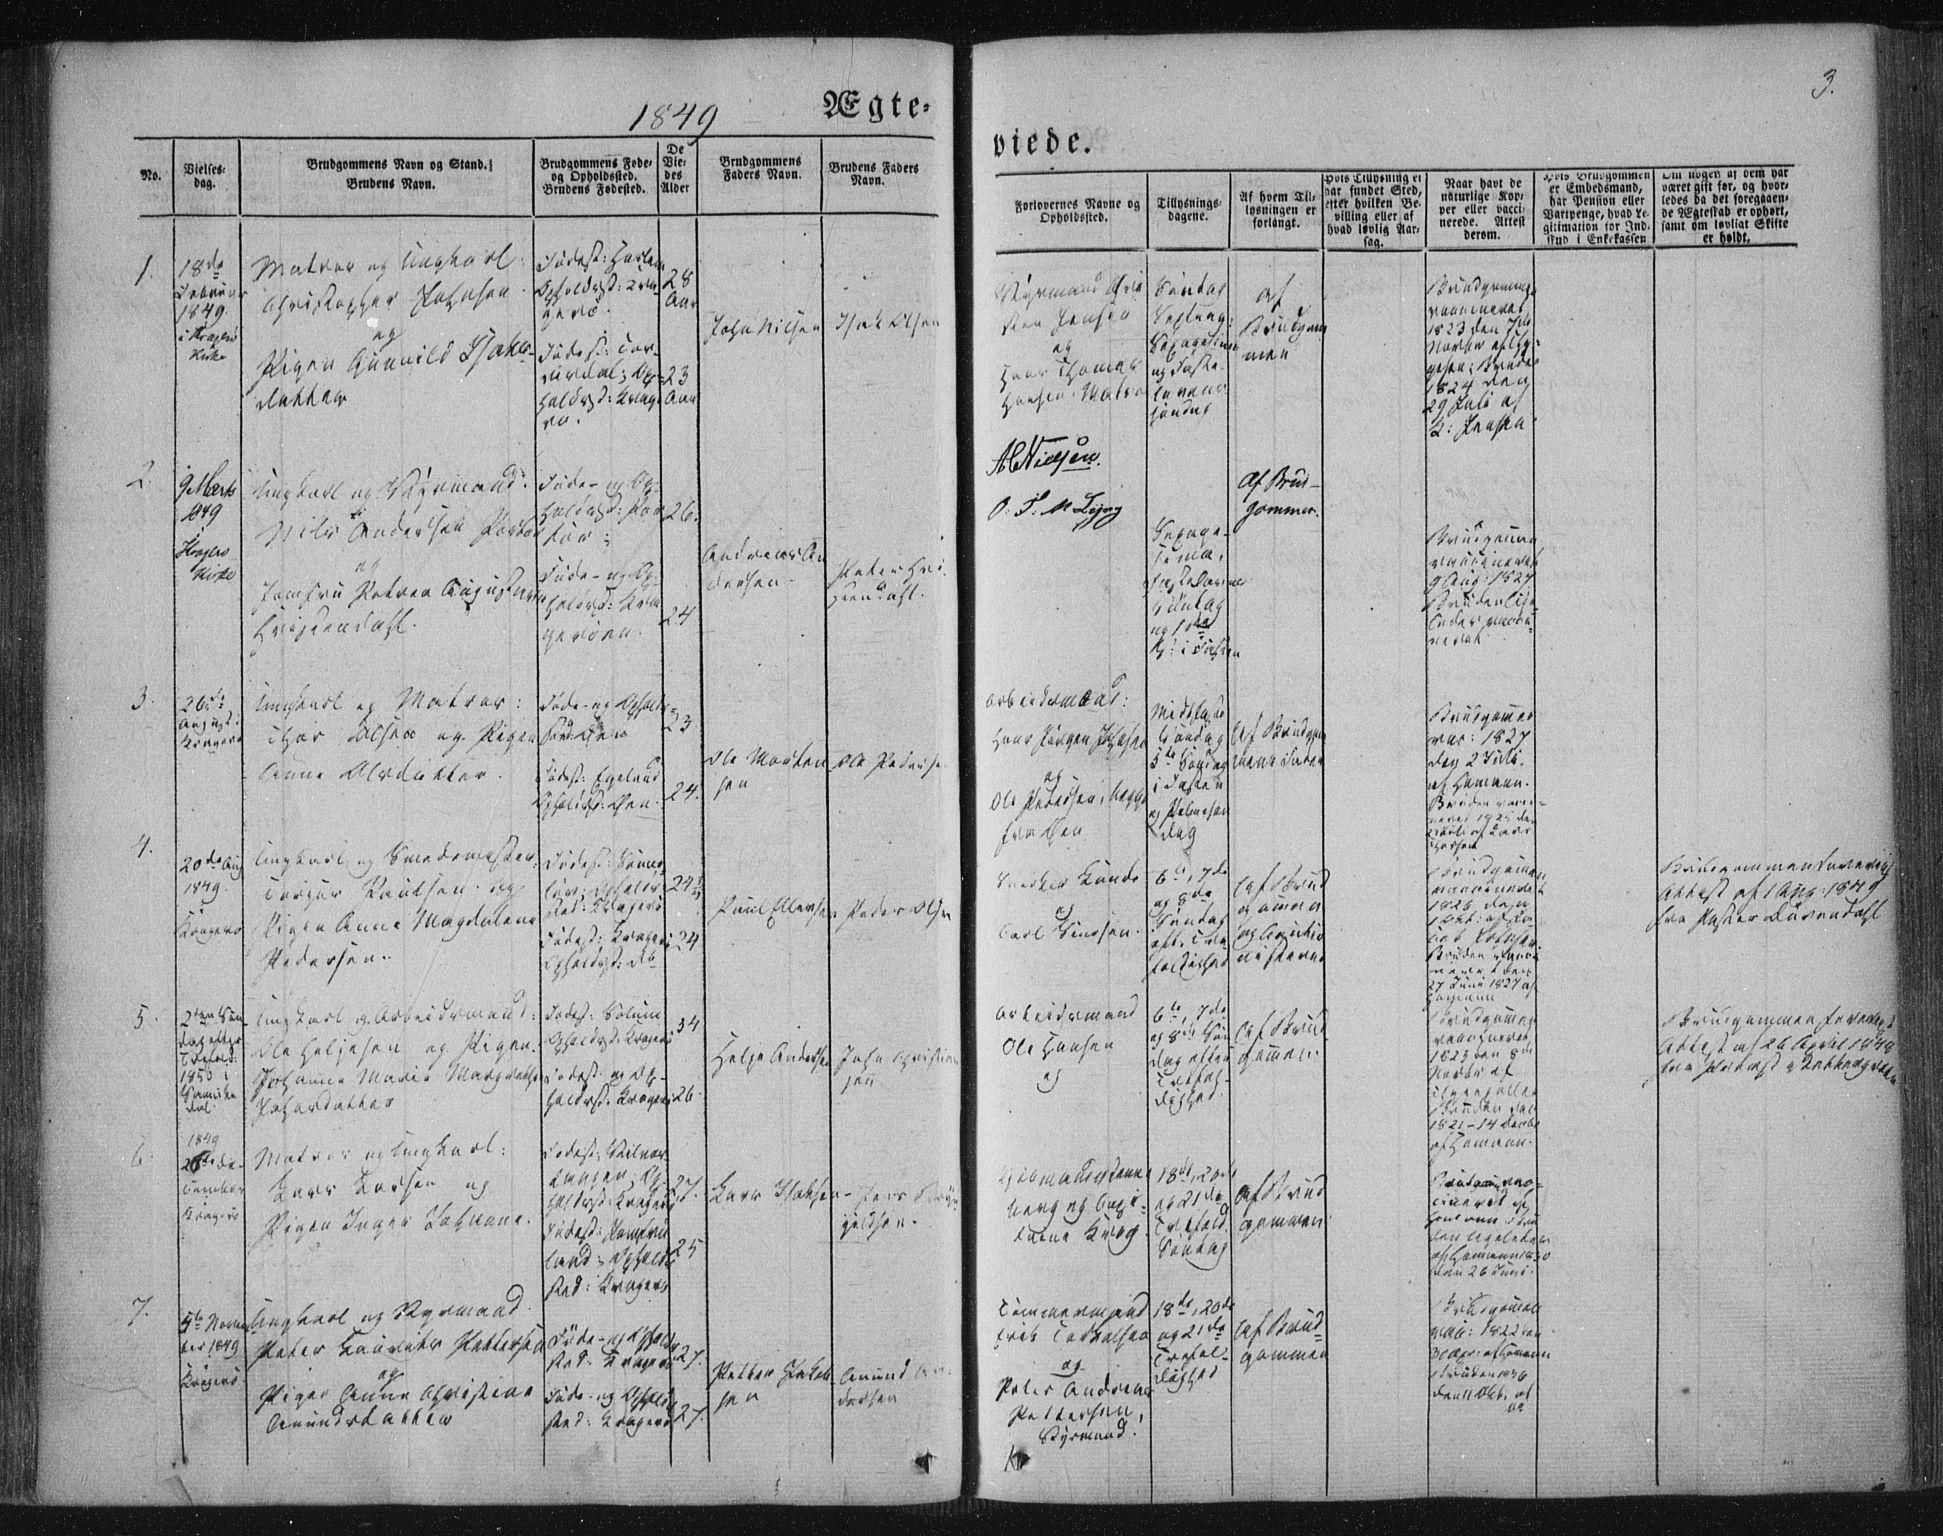 SAKO, Kragerø kirkebøker, F/Fa/L0006: Ministerialbok nr. 6, 1847-1861, s. 3